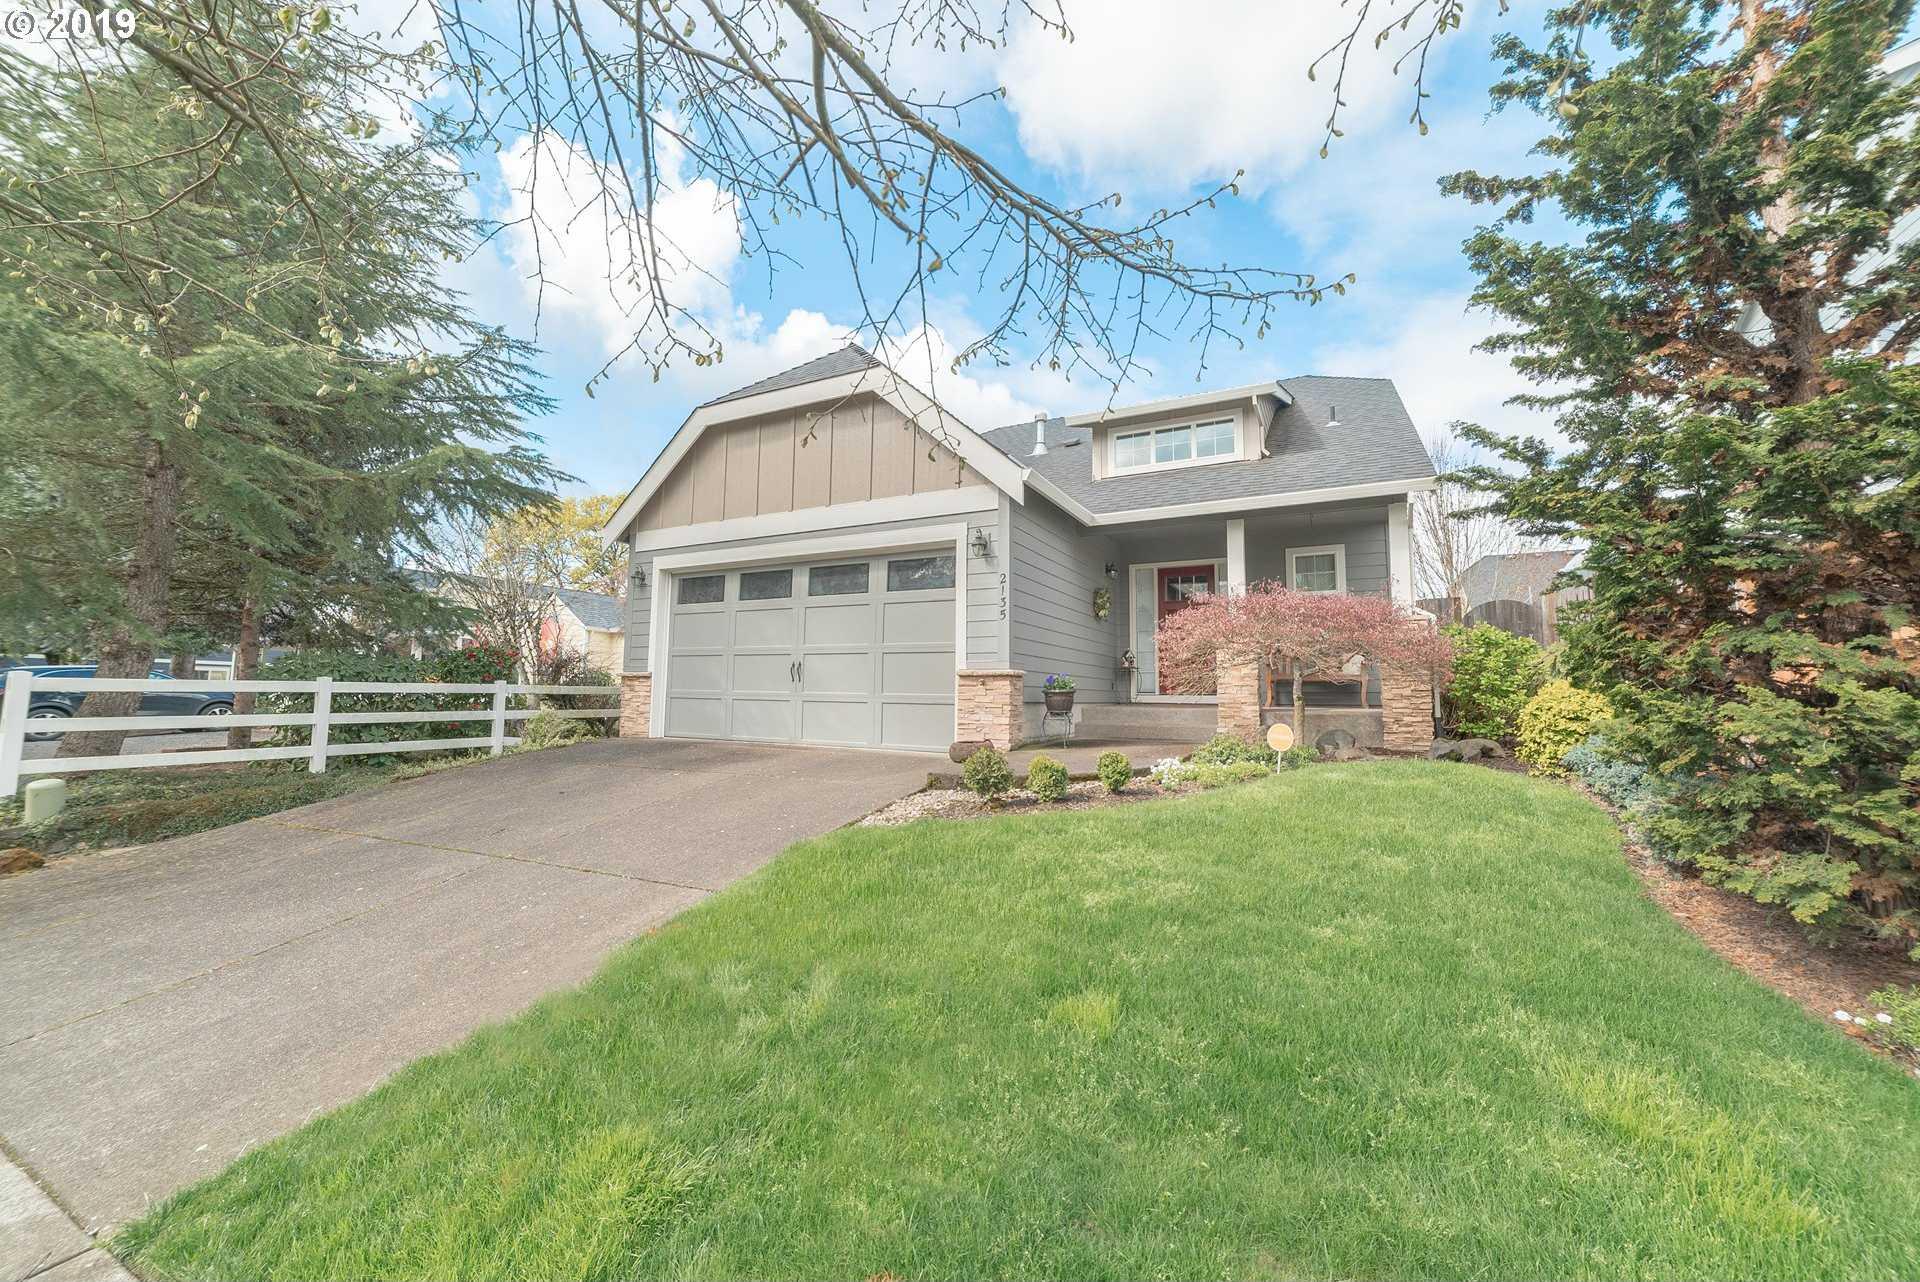 $417,000 - 3Br/3Ba -  for Sale in Josies Meadow, Newberg